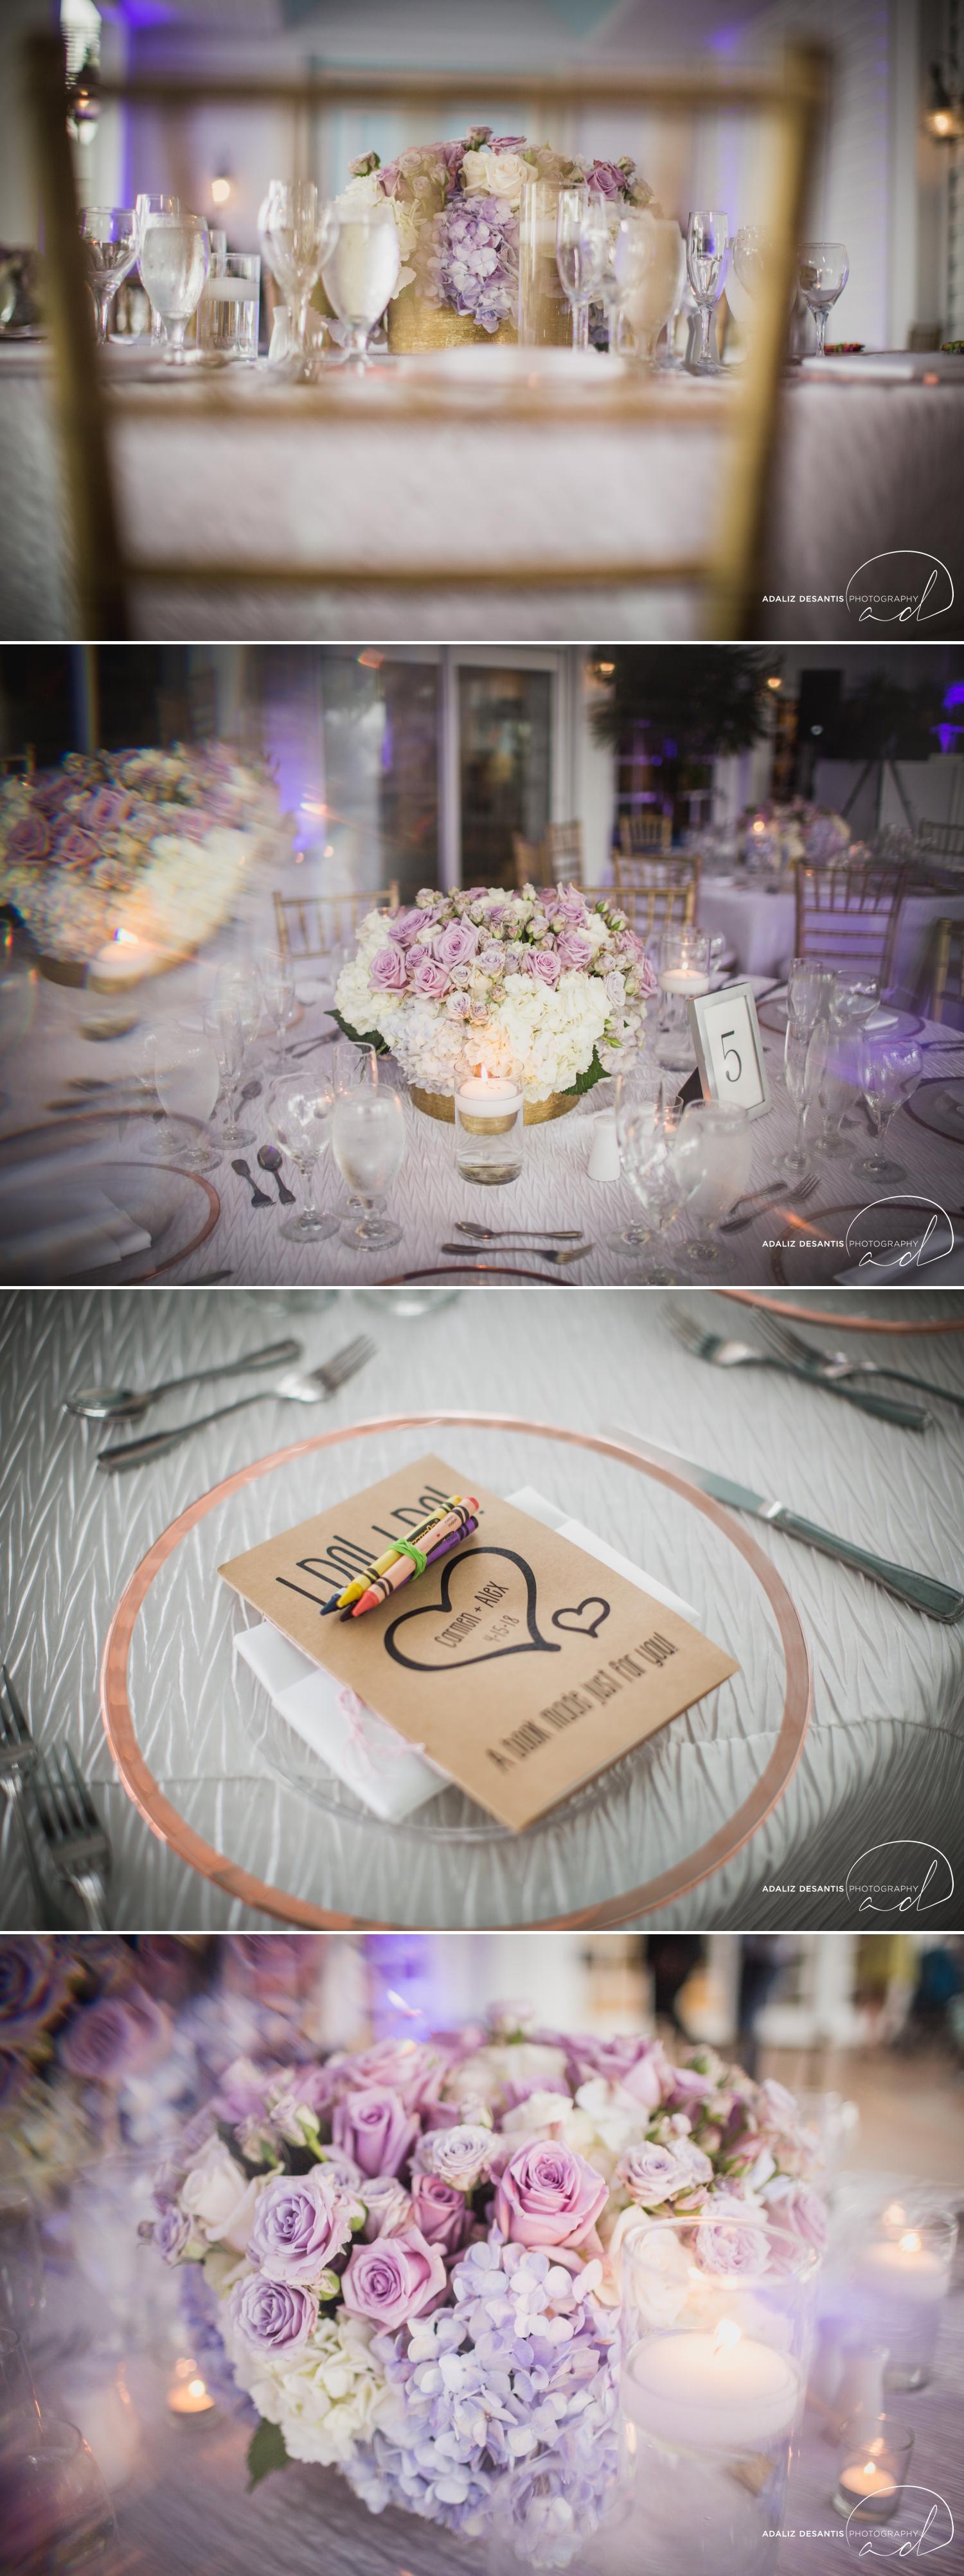 Carmen Alex palms hotel spa miami beach destination wedding lavender roses cuban cigar England cuba bride rose gold elegant Maggie Sottero Badgley Mischka 16.jpg